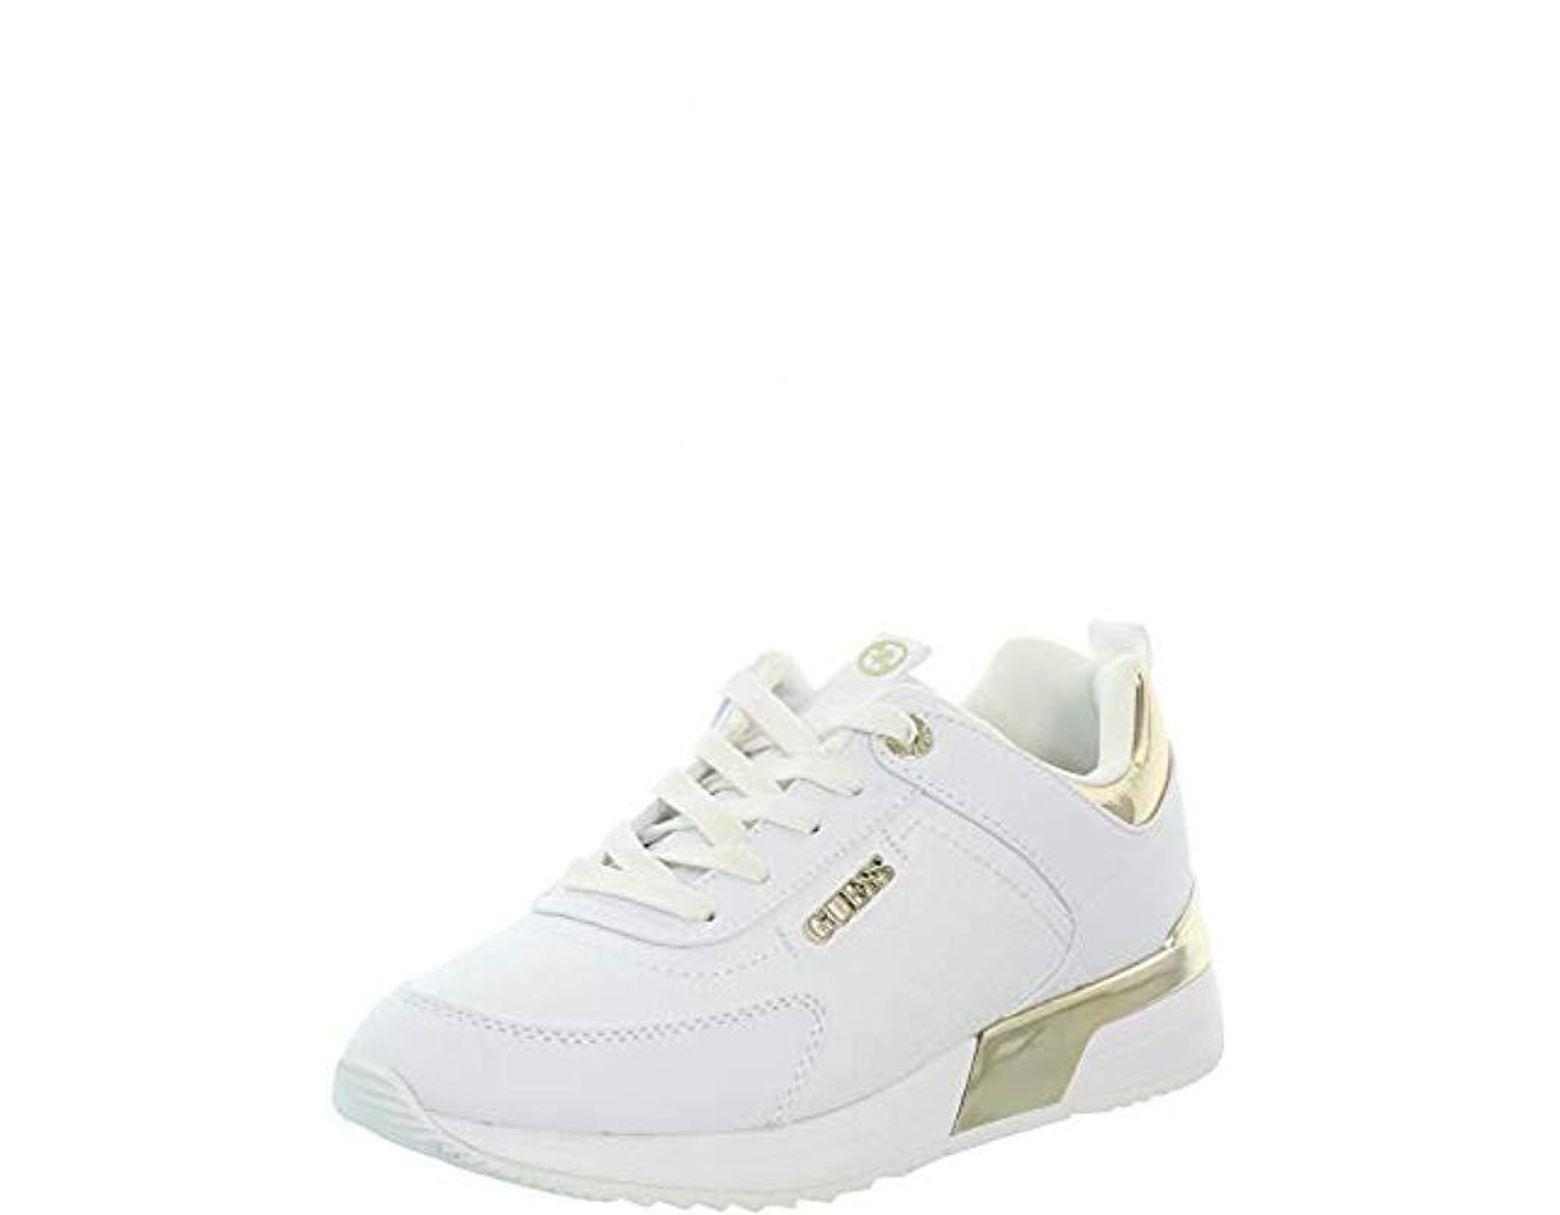 White GuessMarlyn Fal12Sneakers Lyst Fl5mrl In 4LR5qjA3